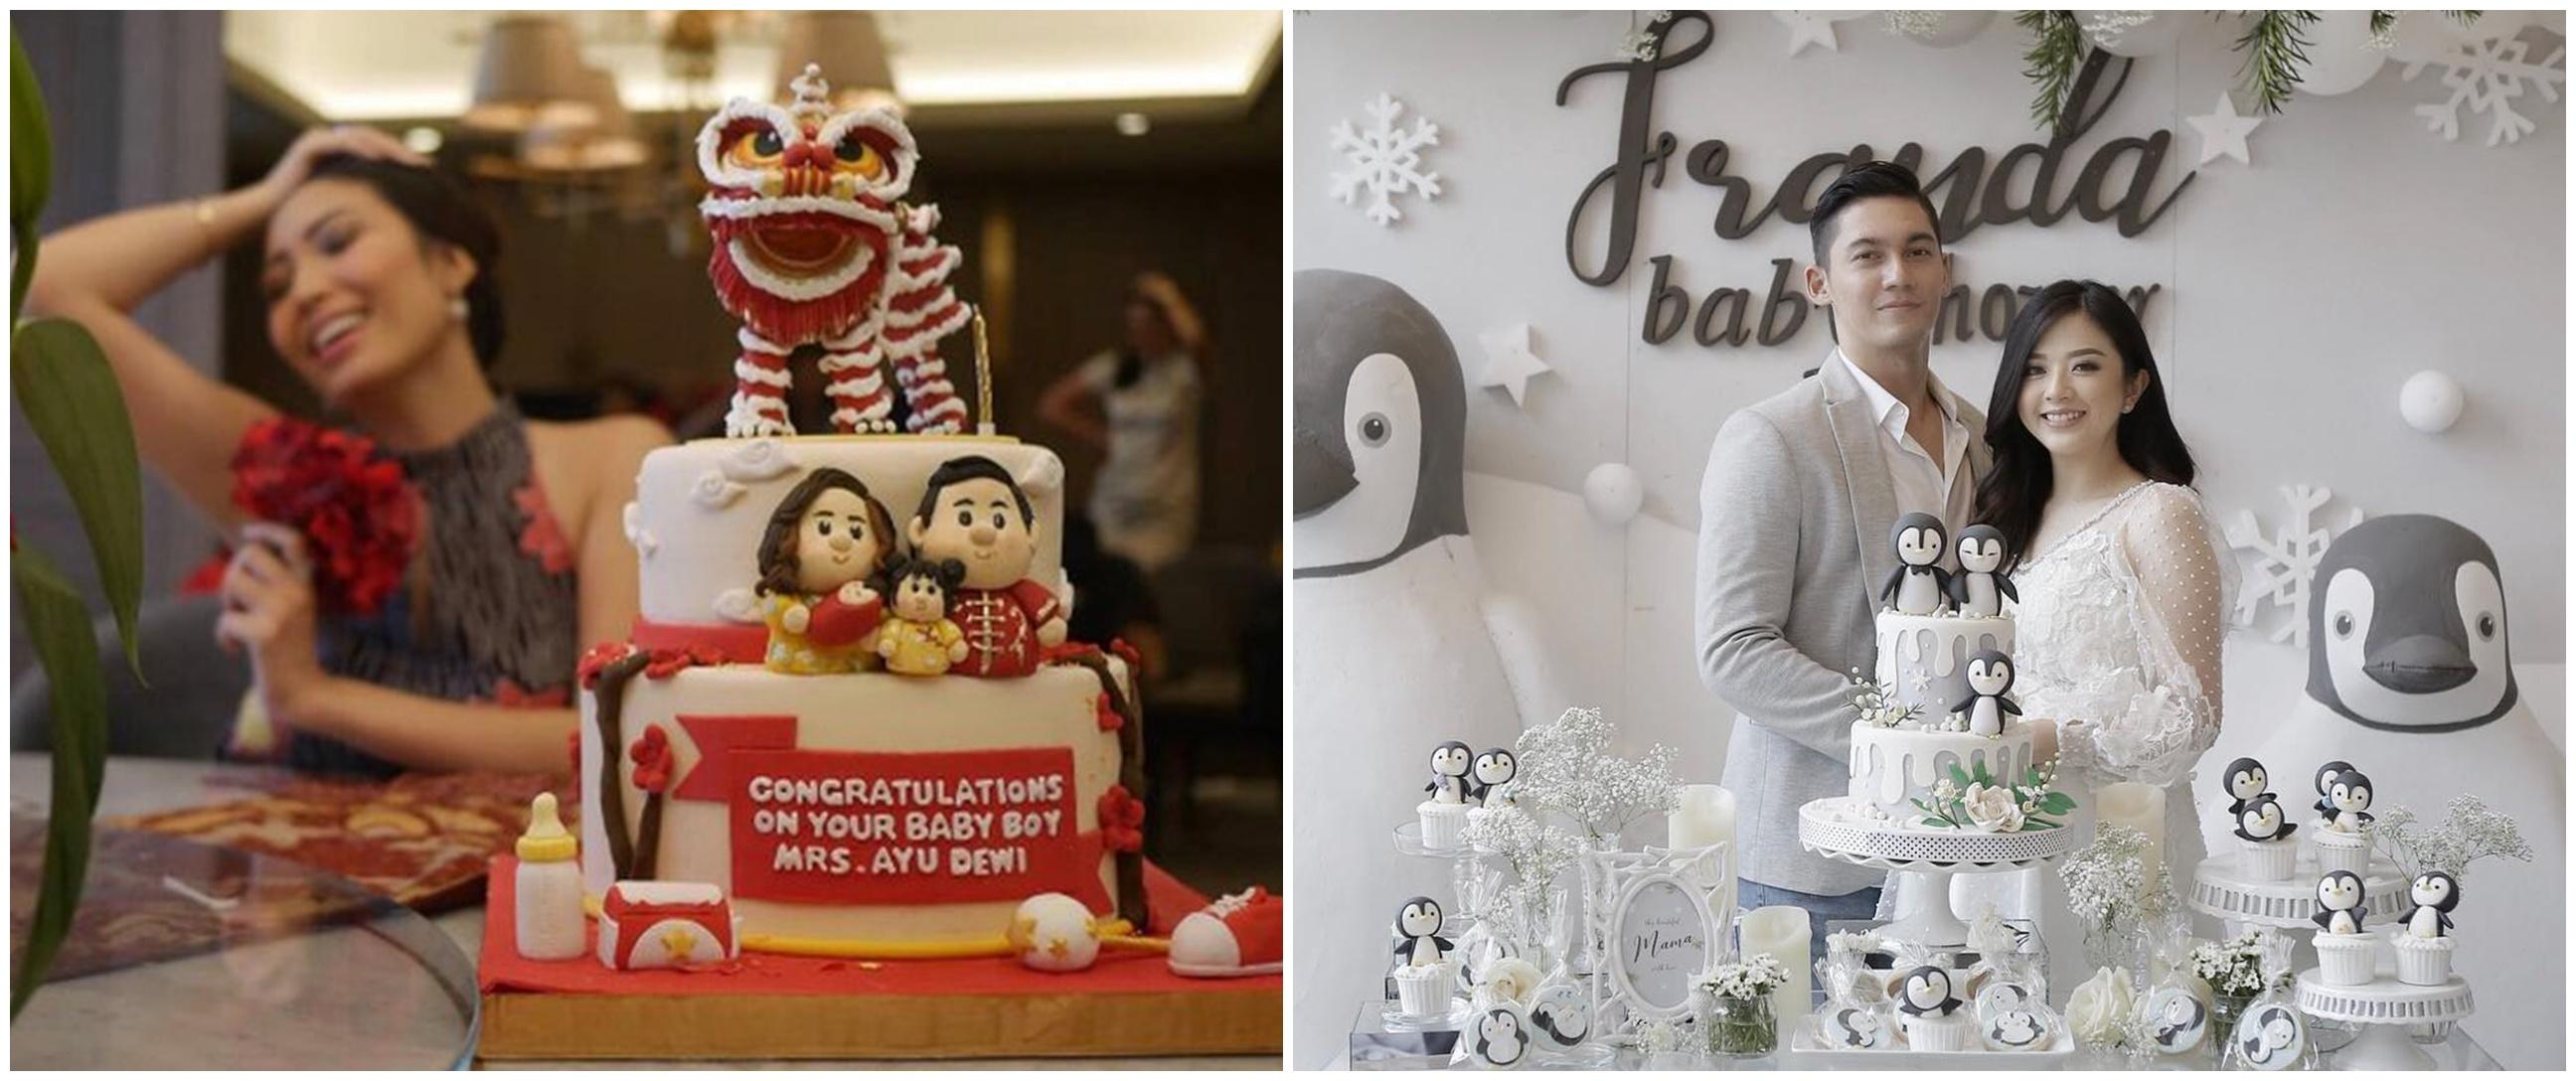 Potret kue baby shower 10 seleb ini unik, bikin sayang dimakan